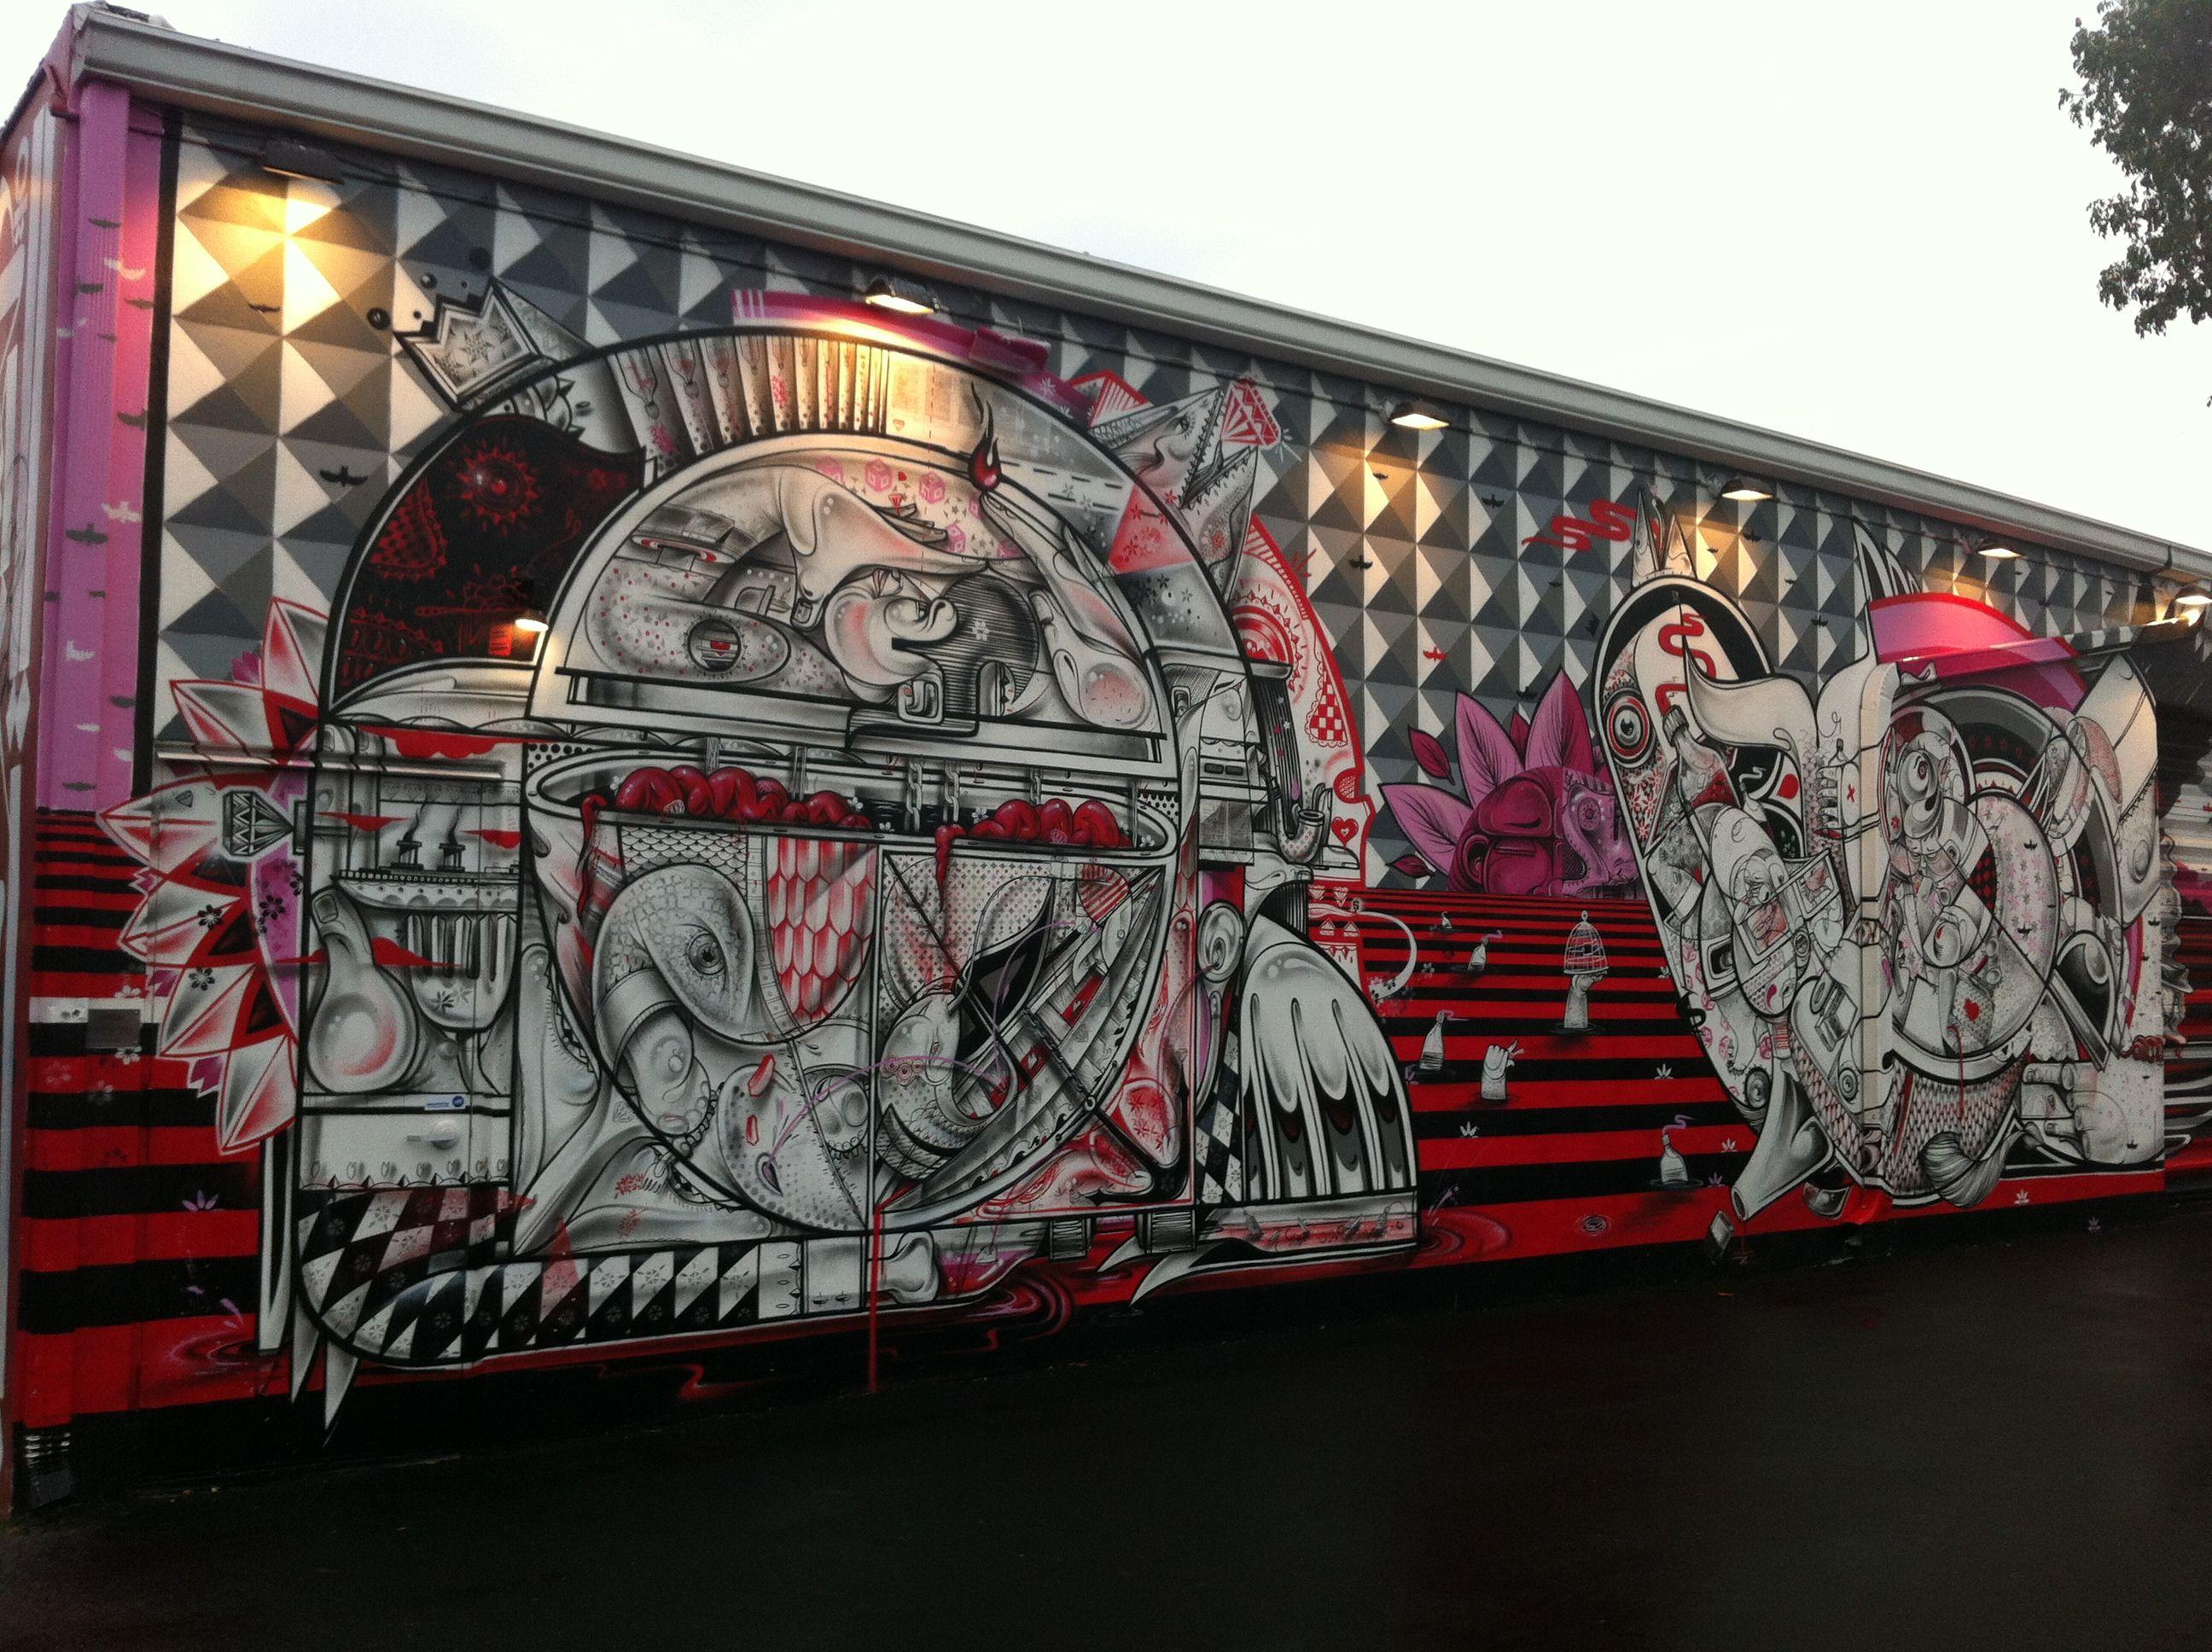 Wynwood Walls Miami, FL. #design #mural #wynwood #miami #street #art ...